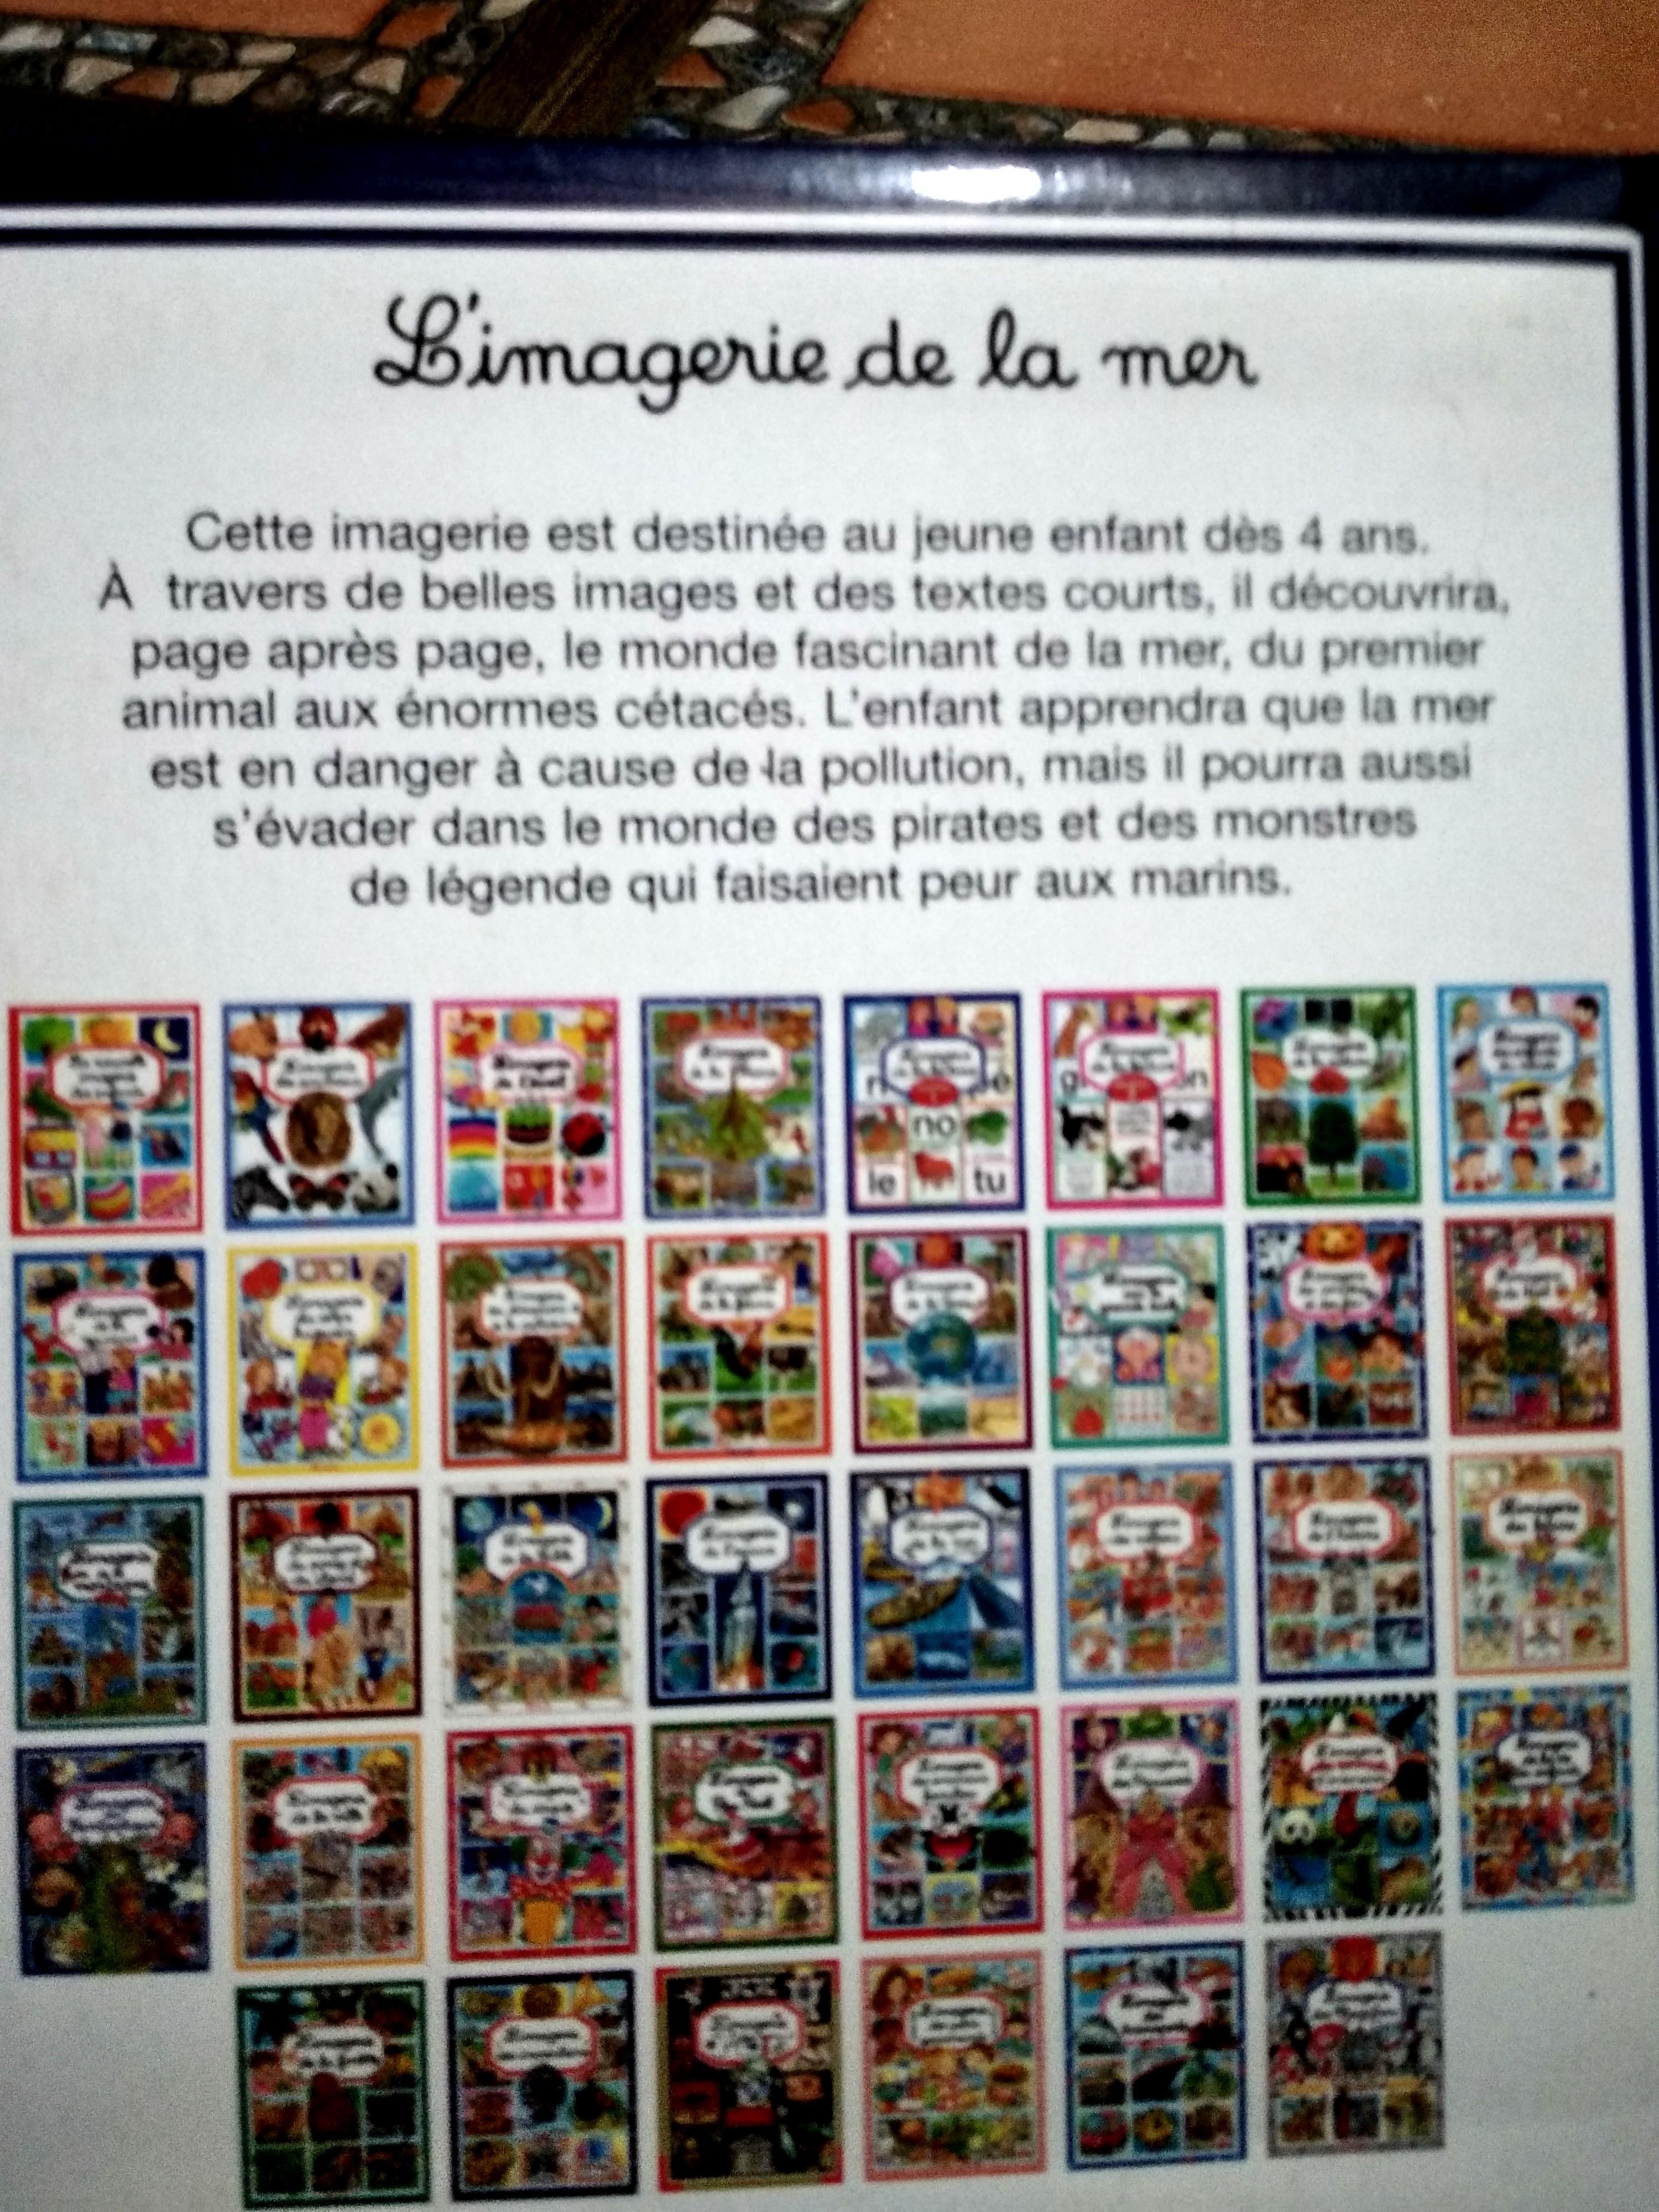 L'imagerie de la mer, (tentang laut), #mauthr Buku Anak, Bhs. Perancis